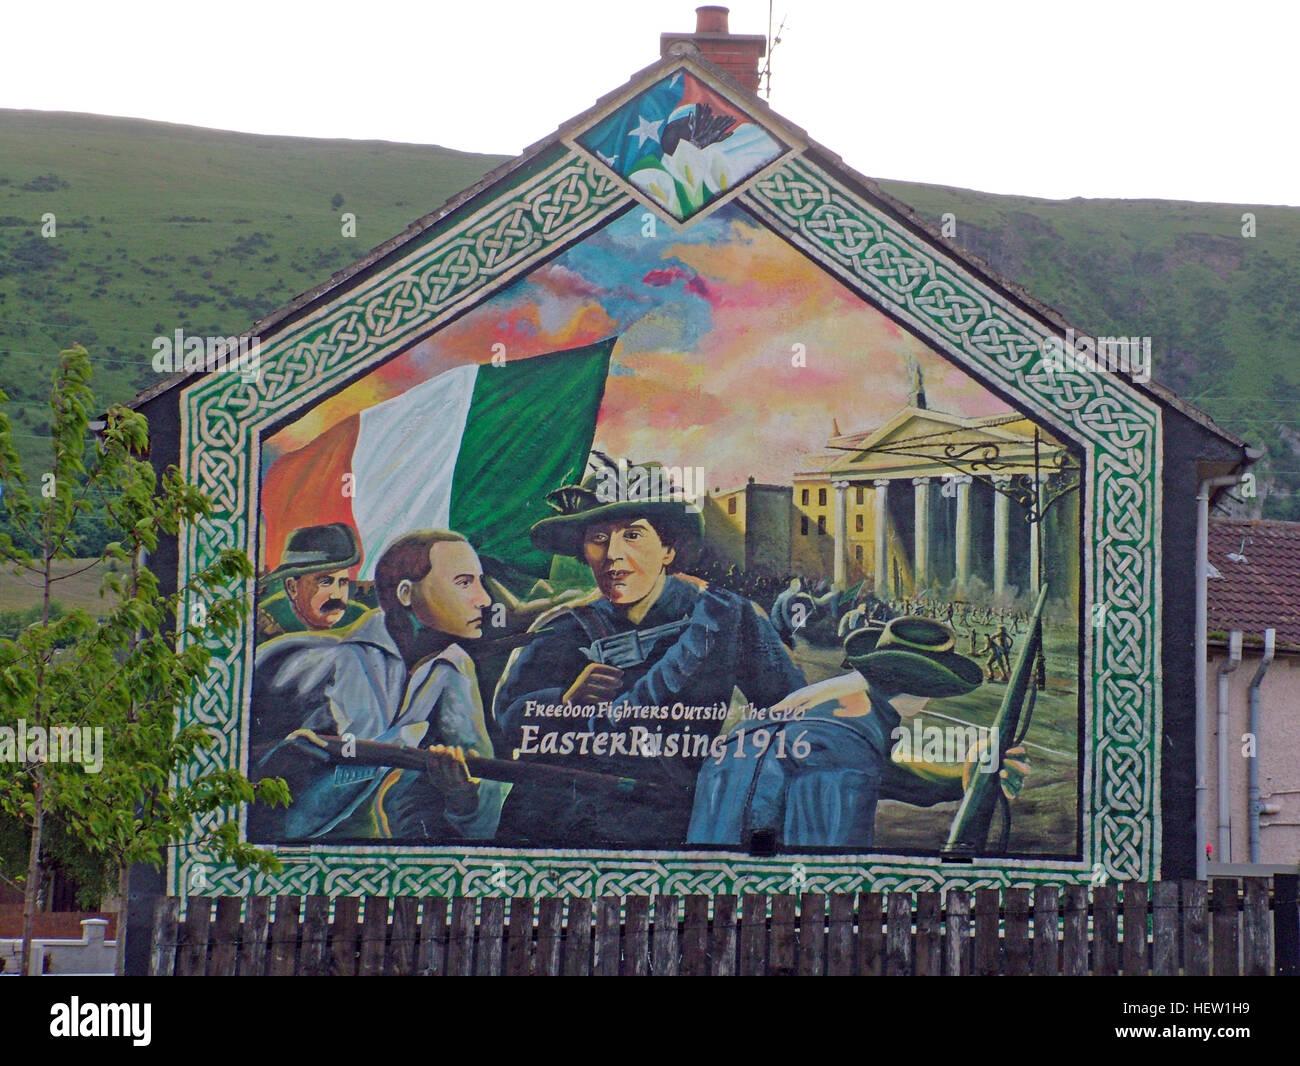 Belfast falls rd republican mural easter rising stock for Easter rising mural